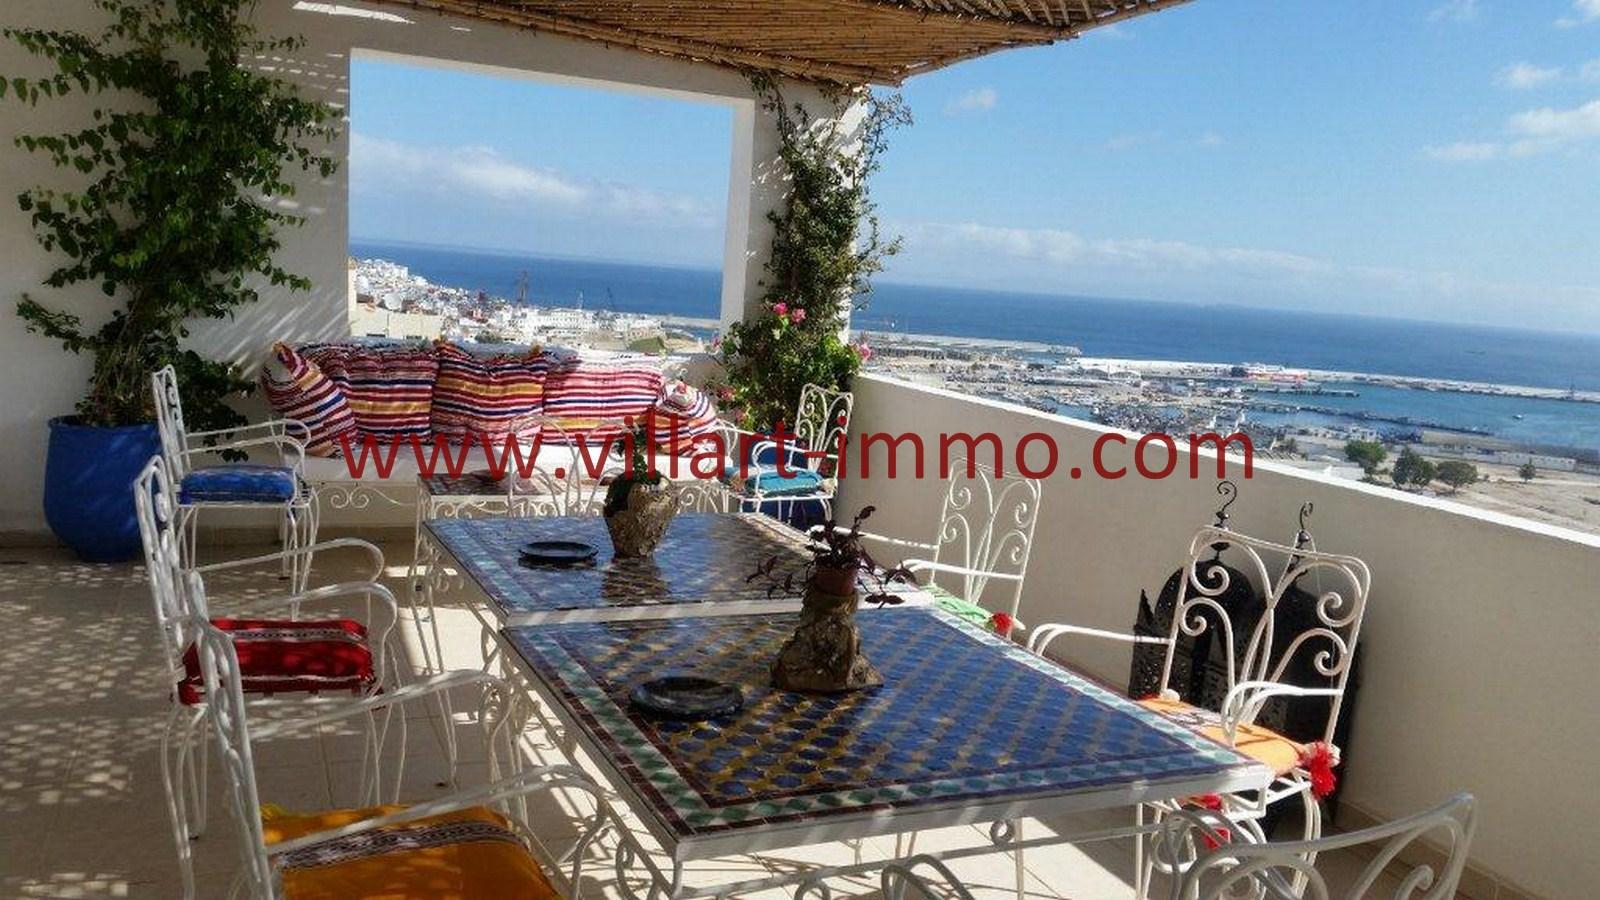 1-Vente-Appartement-Tanger-Centre-De-Ville-Terrasse 1-VA502-Villart Immo